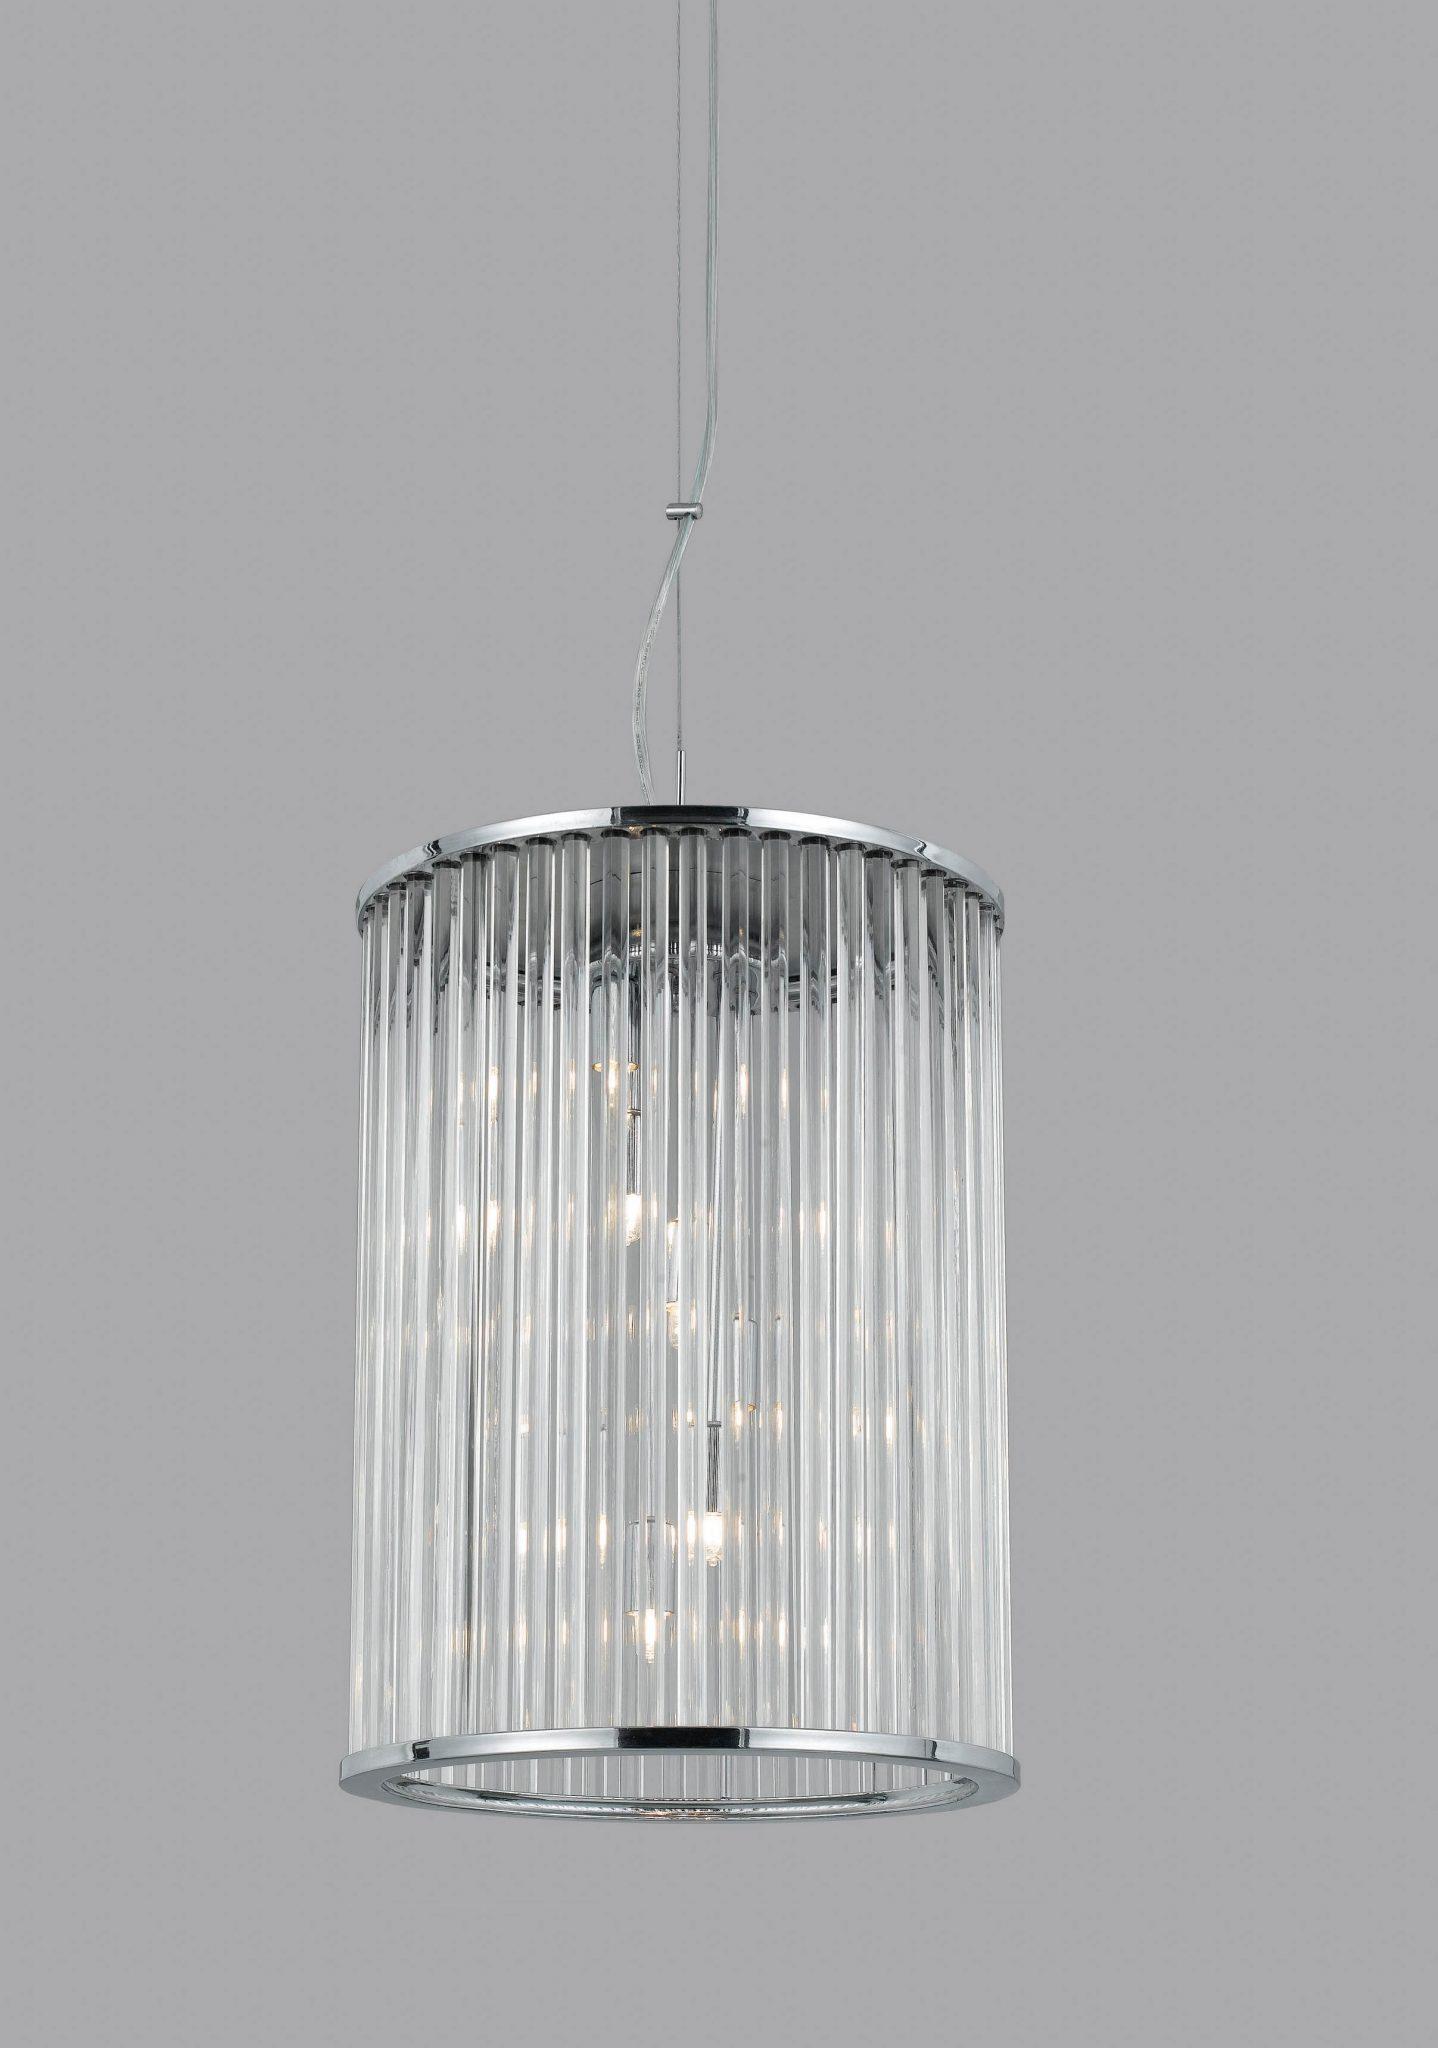 Impex LG012171/06/CH Oklahoma 6 light Lantern, Chrome